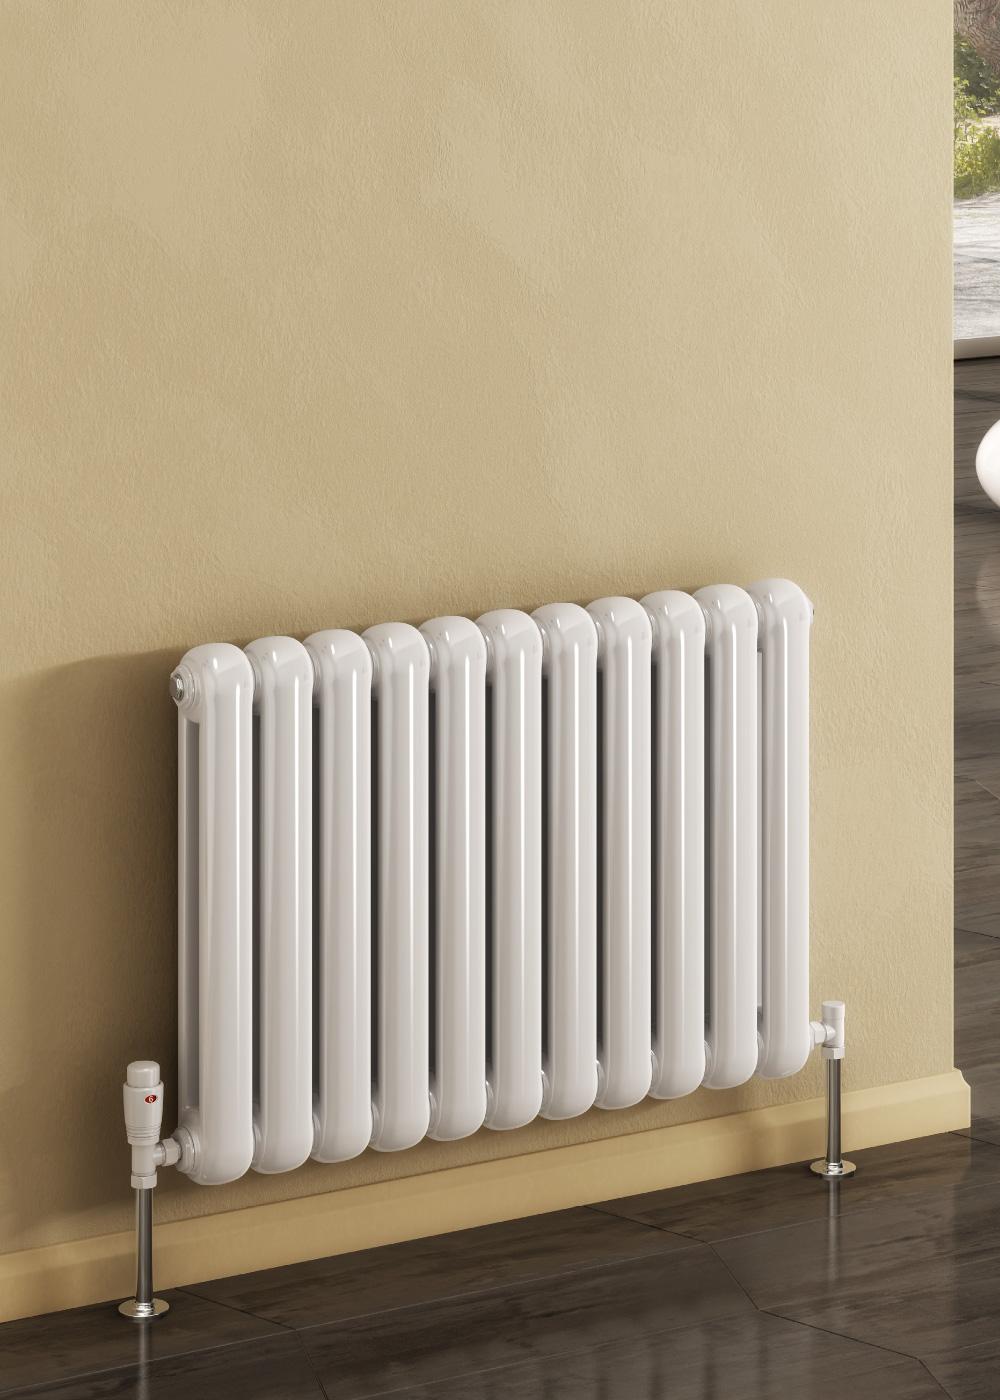 Reina Coneva horizontal radiator on a beige wall